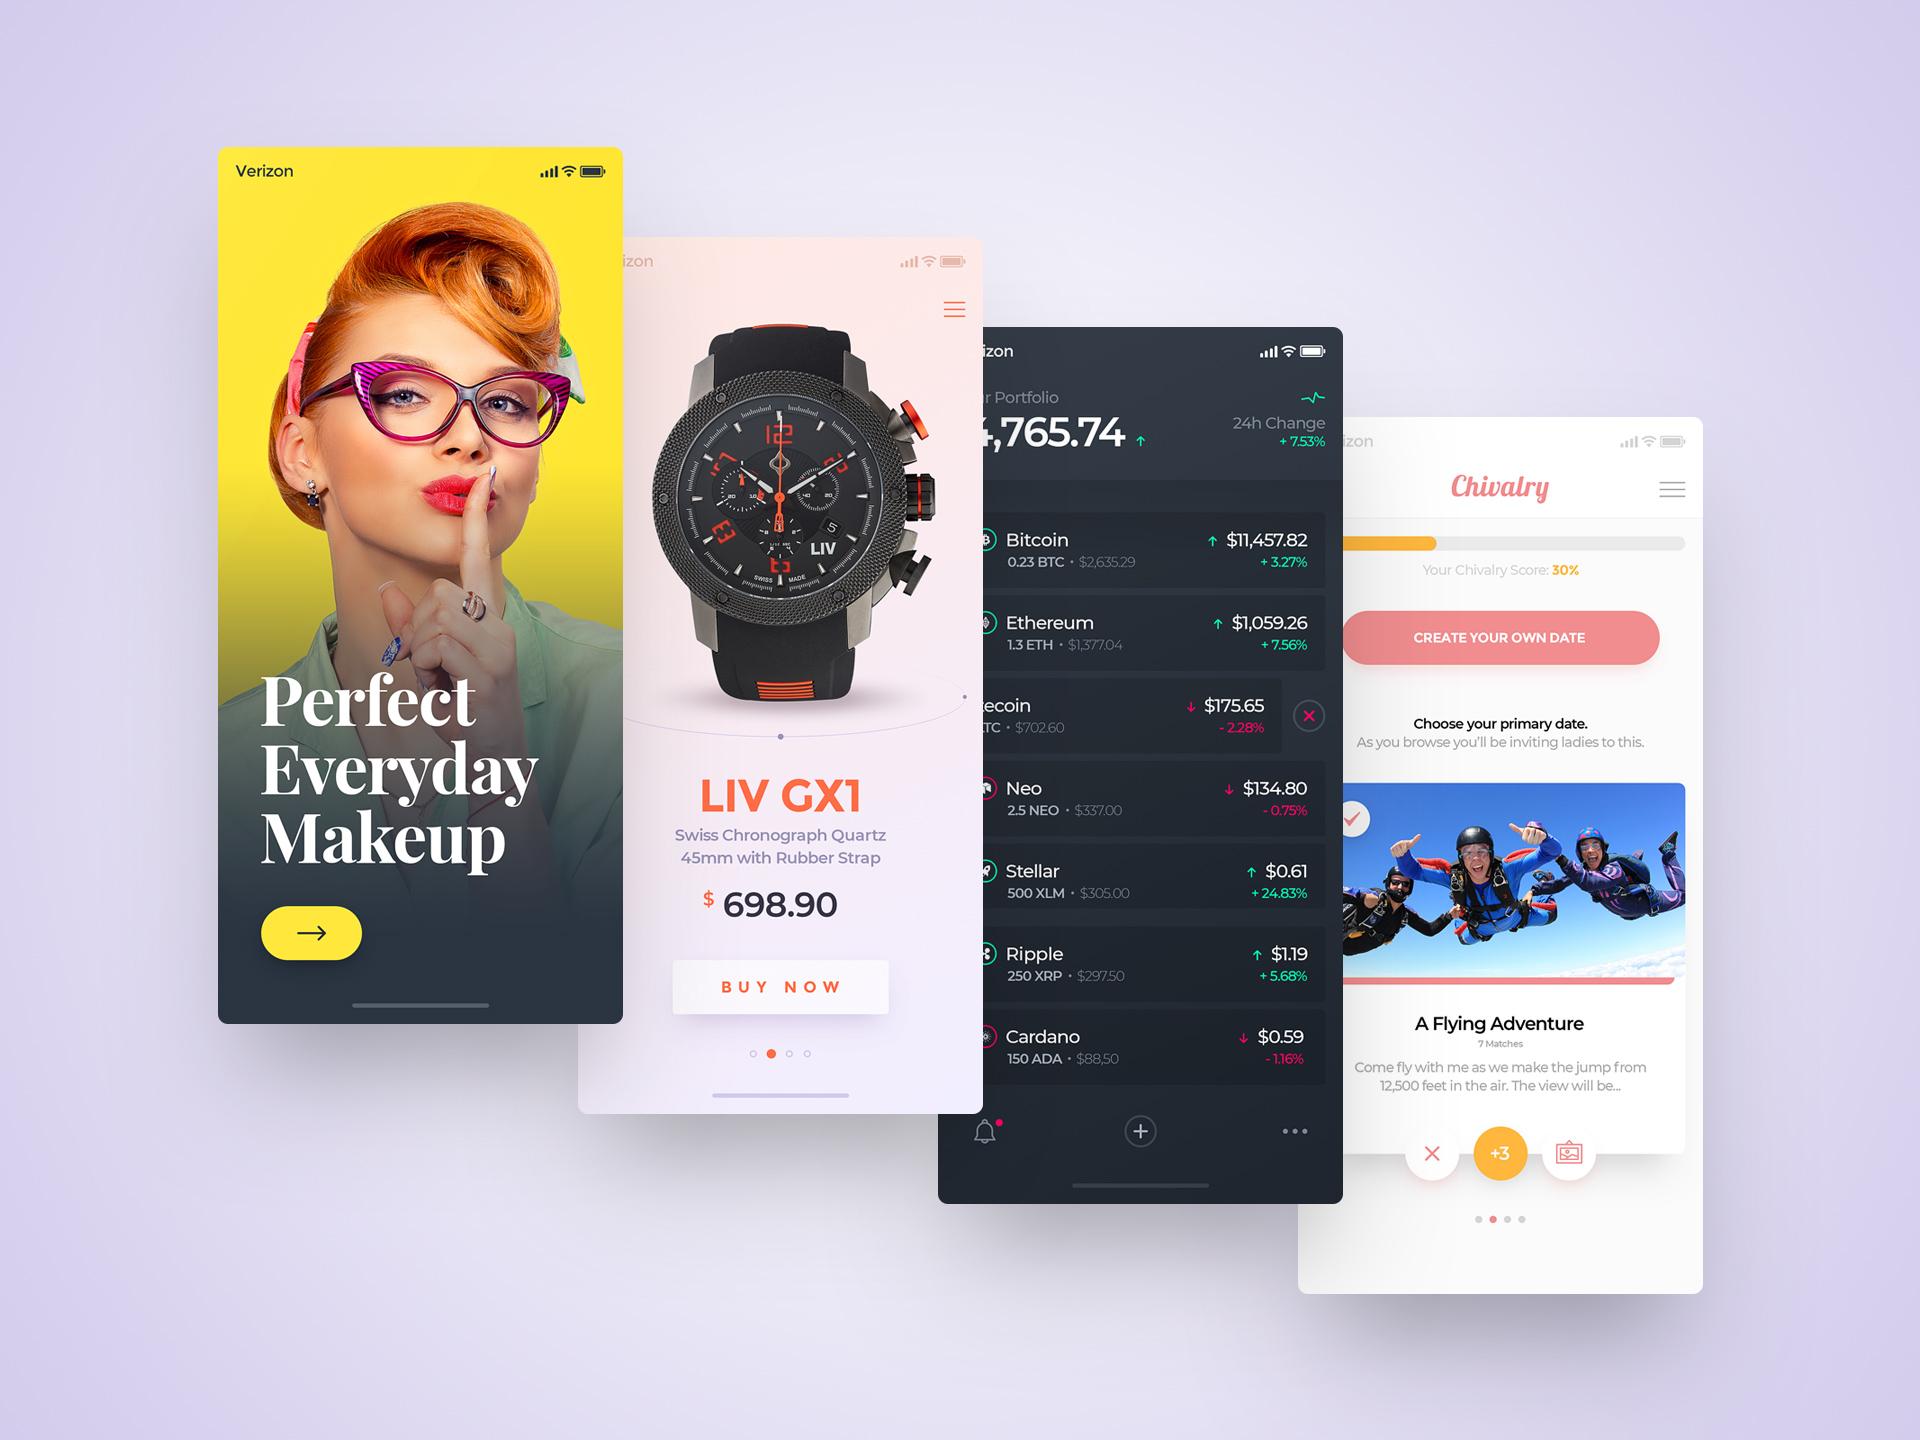 Behance thumbs2 apps1